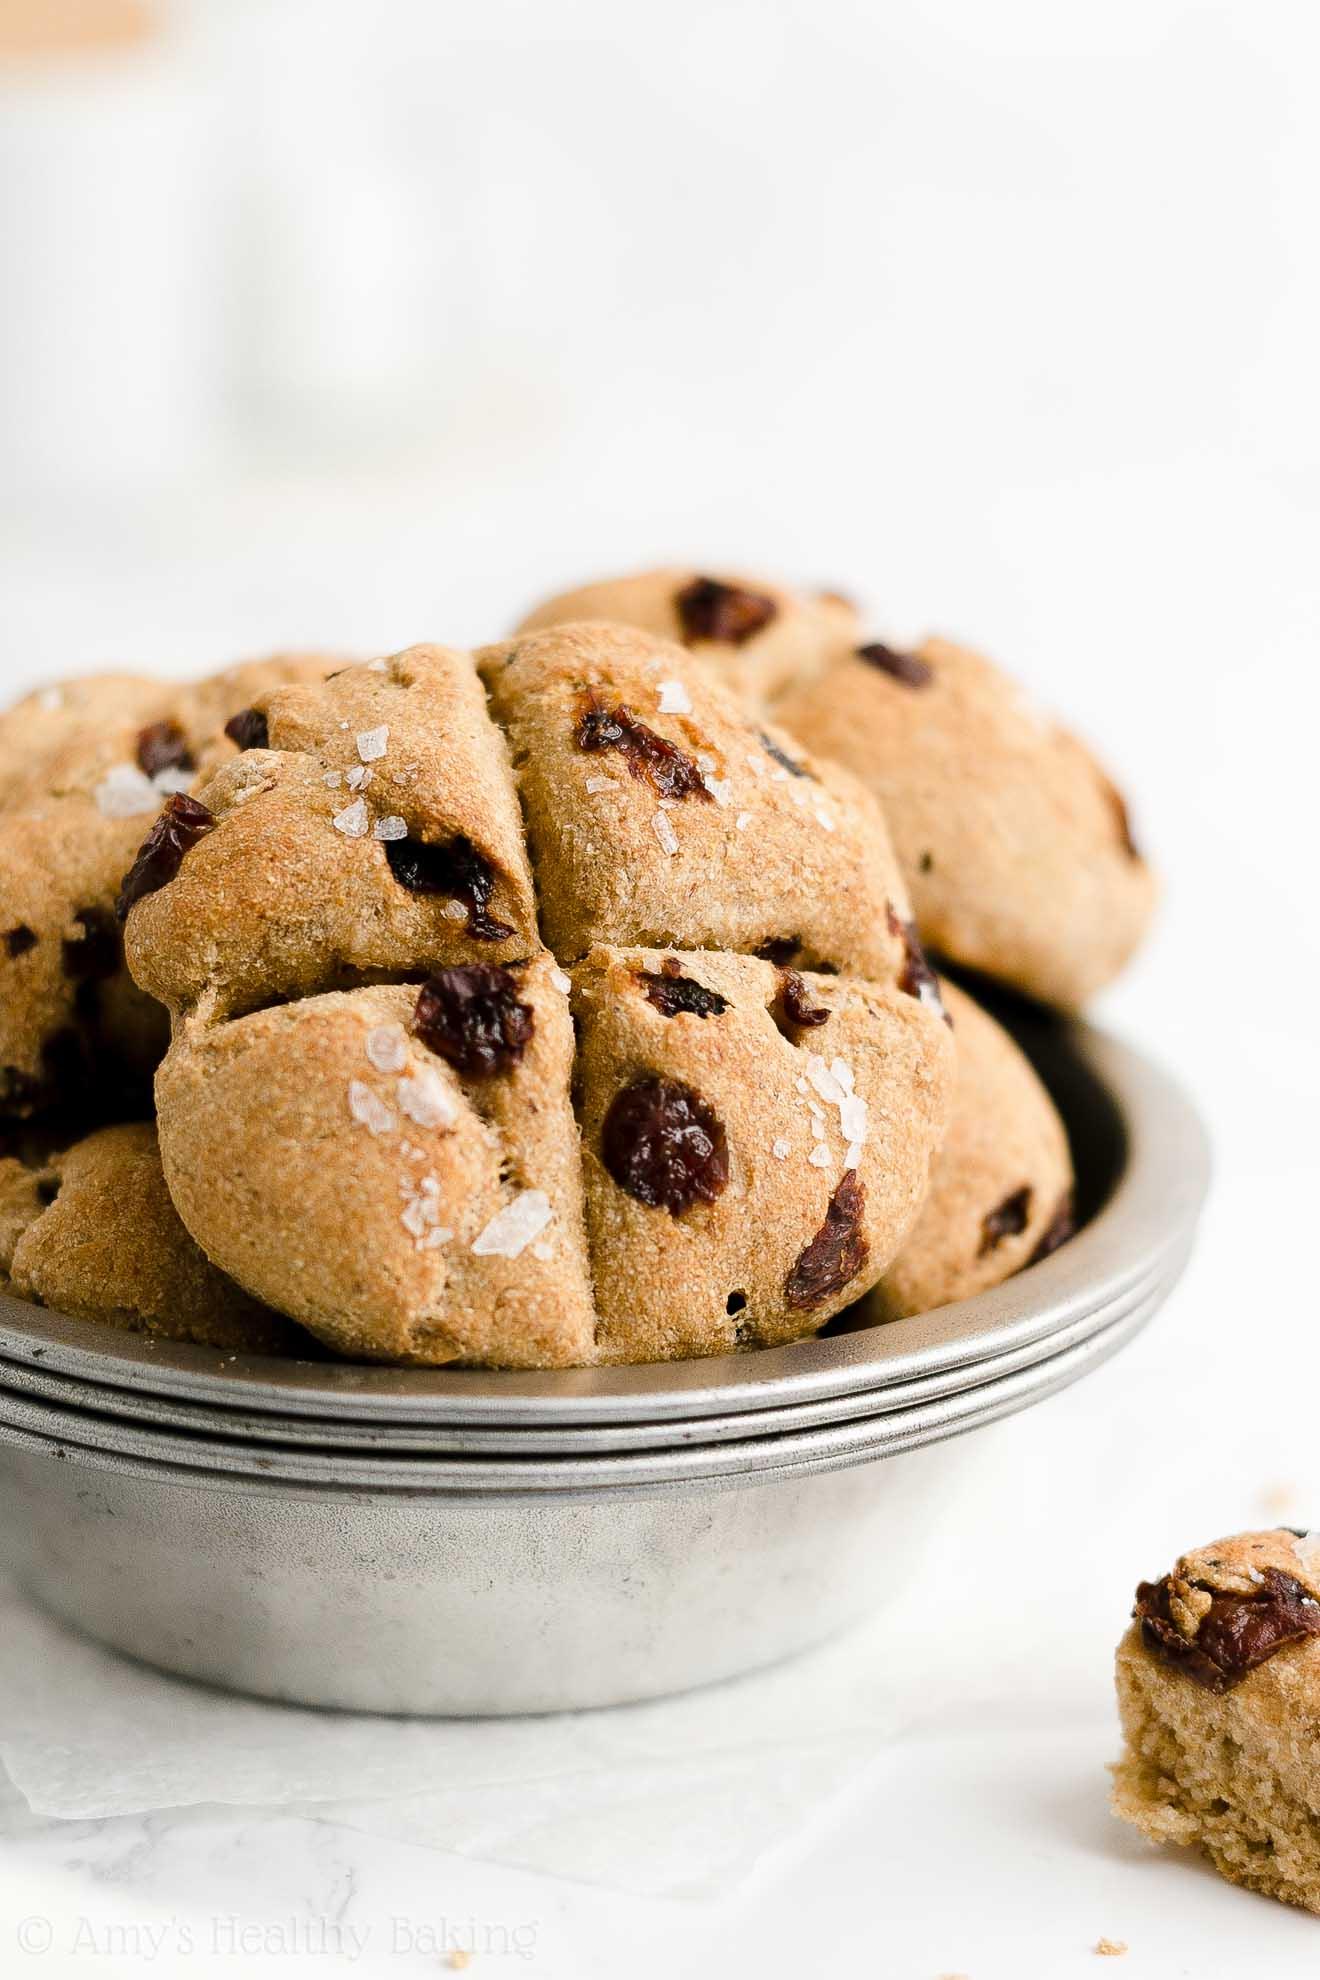 Quick Easy Healthy Gluten Free Vegan Eggless Raisin Irish Soda Bread Scones